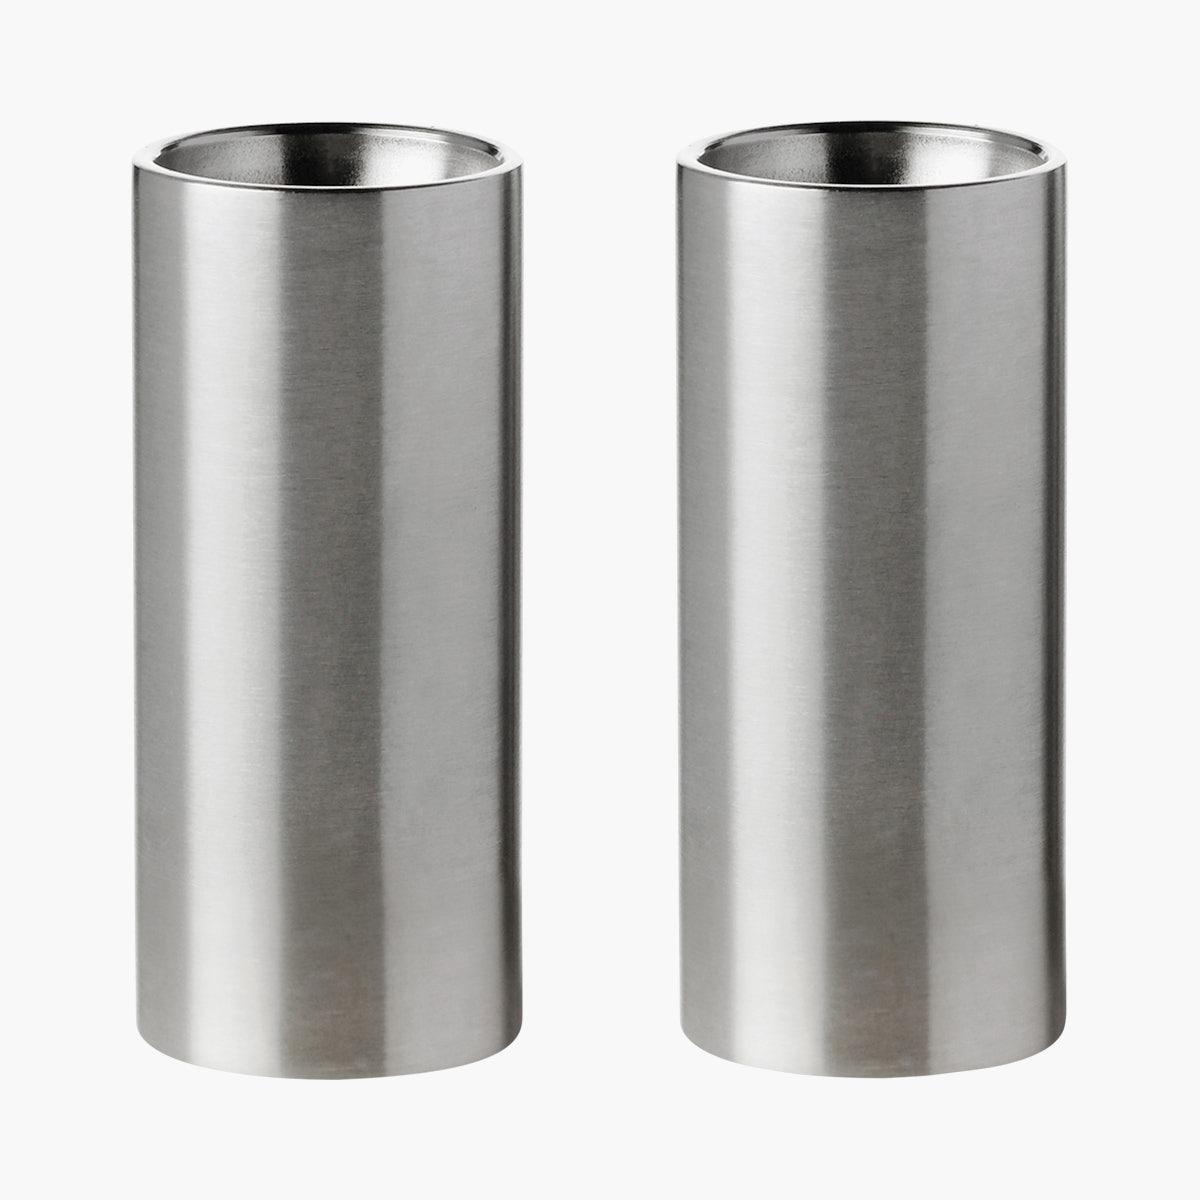 Cylinda Line Salt and Pepper Set